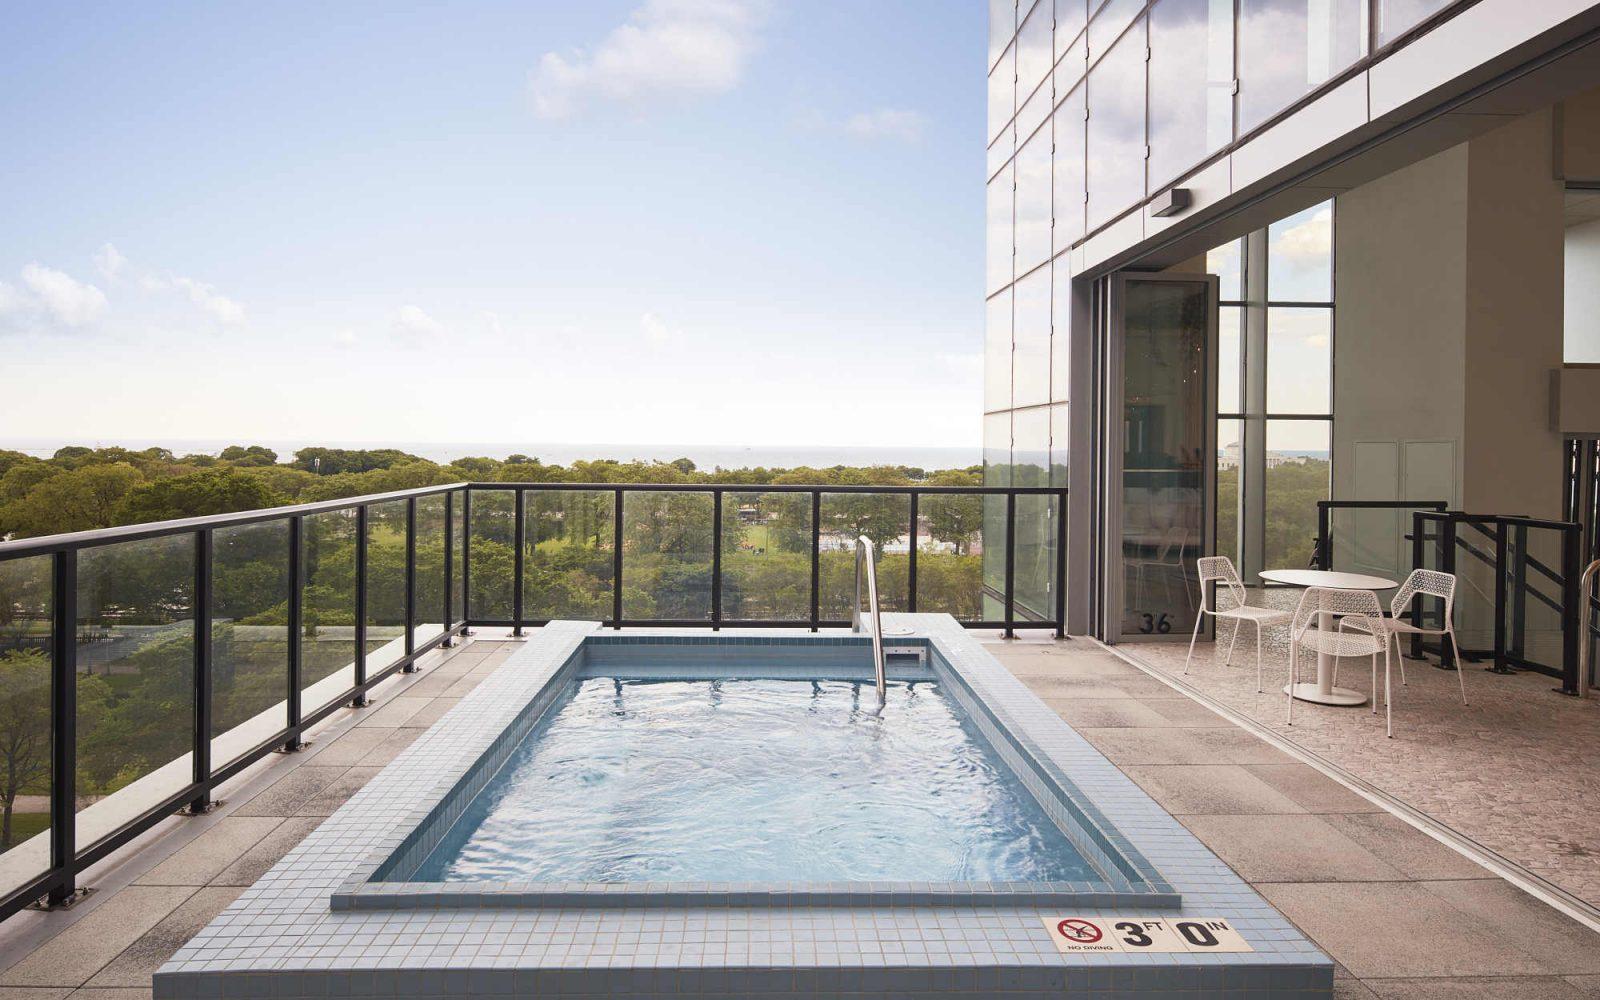 Essex outdoor balcony hot tub